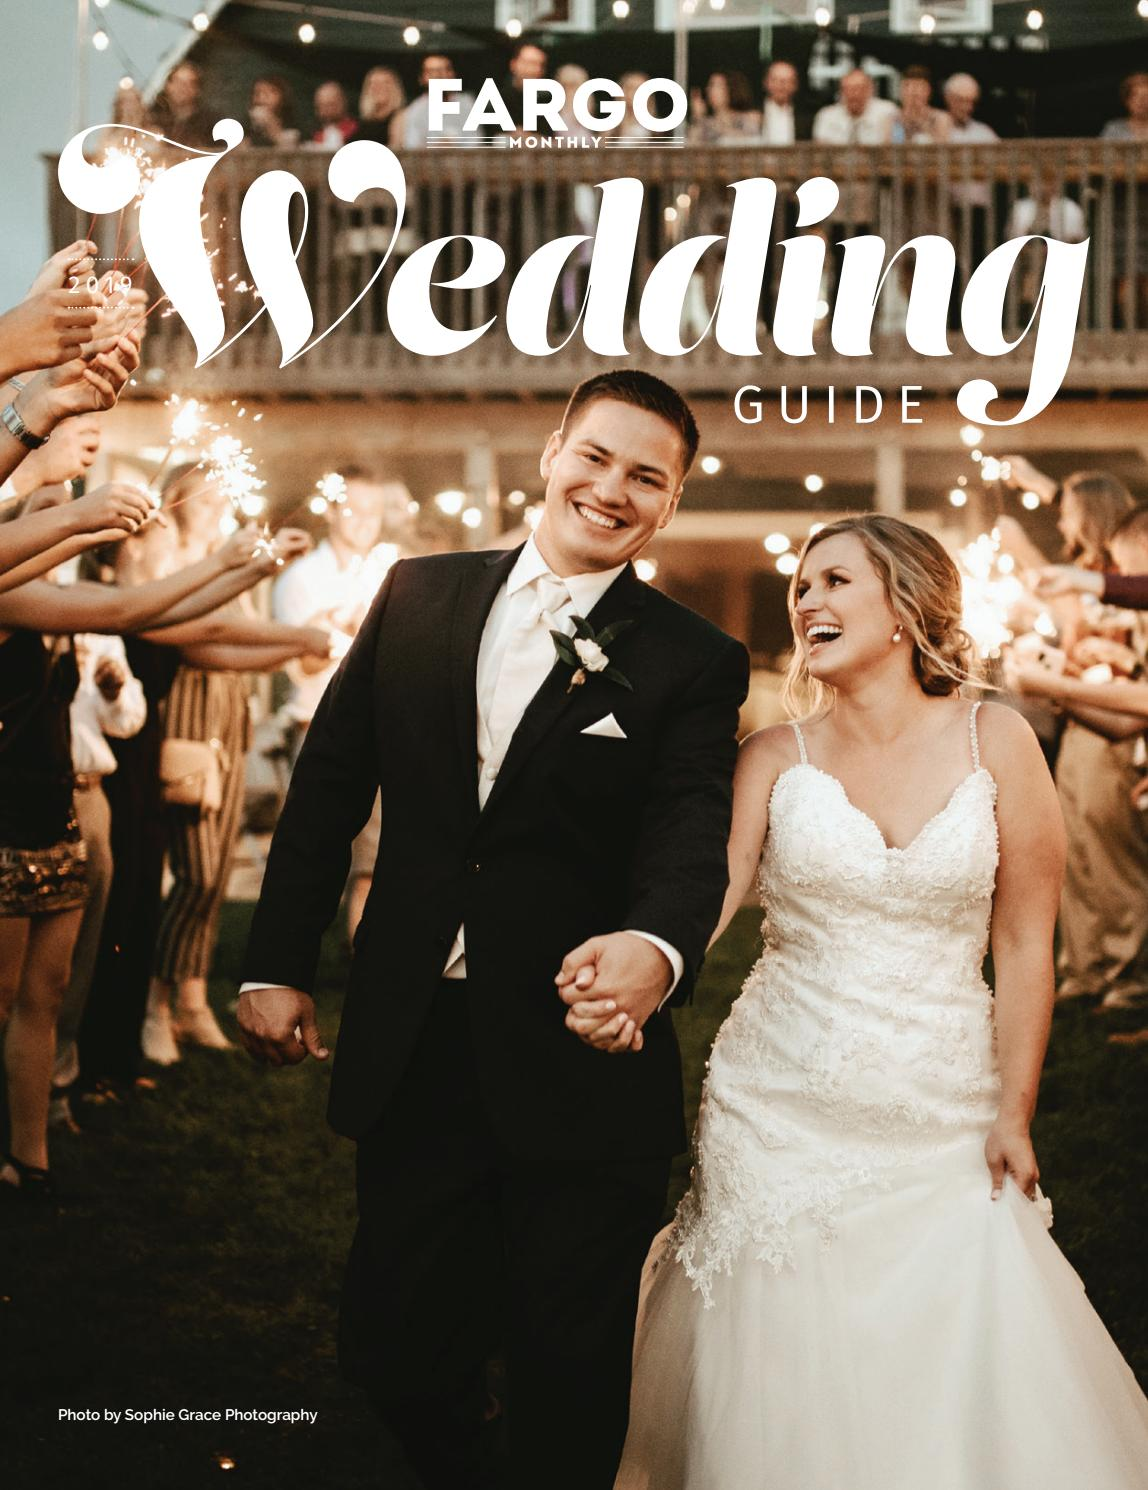 75d5ef38164 Fargo Monthly s Wedding Guide 2019 by Spotlight Media - issuu